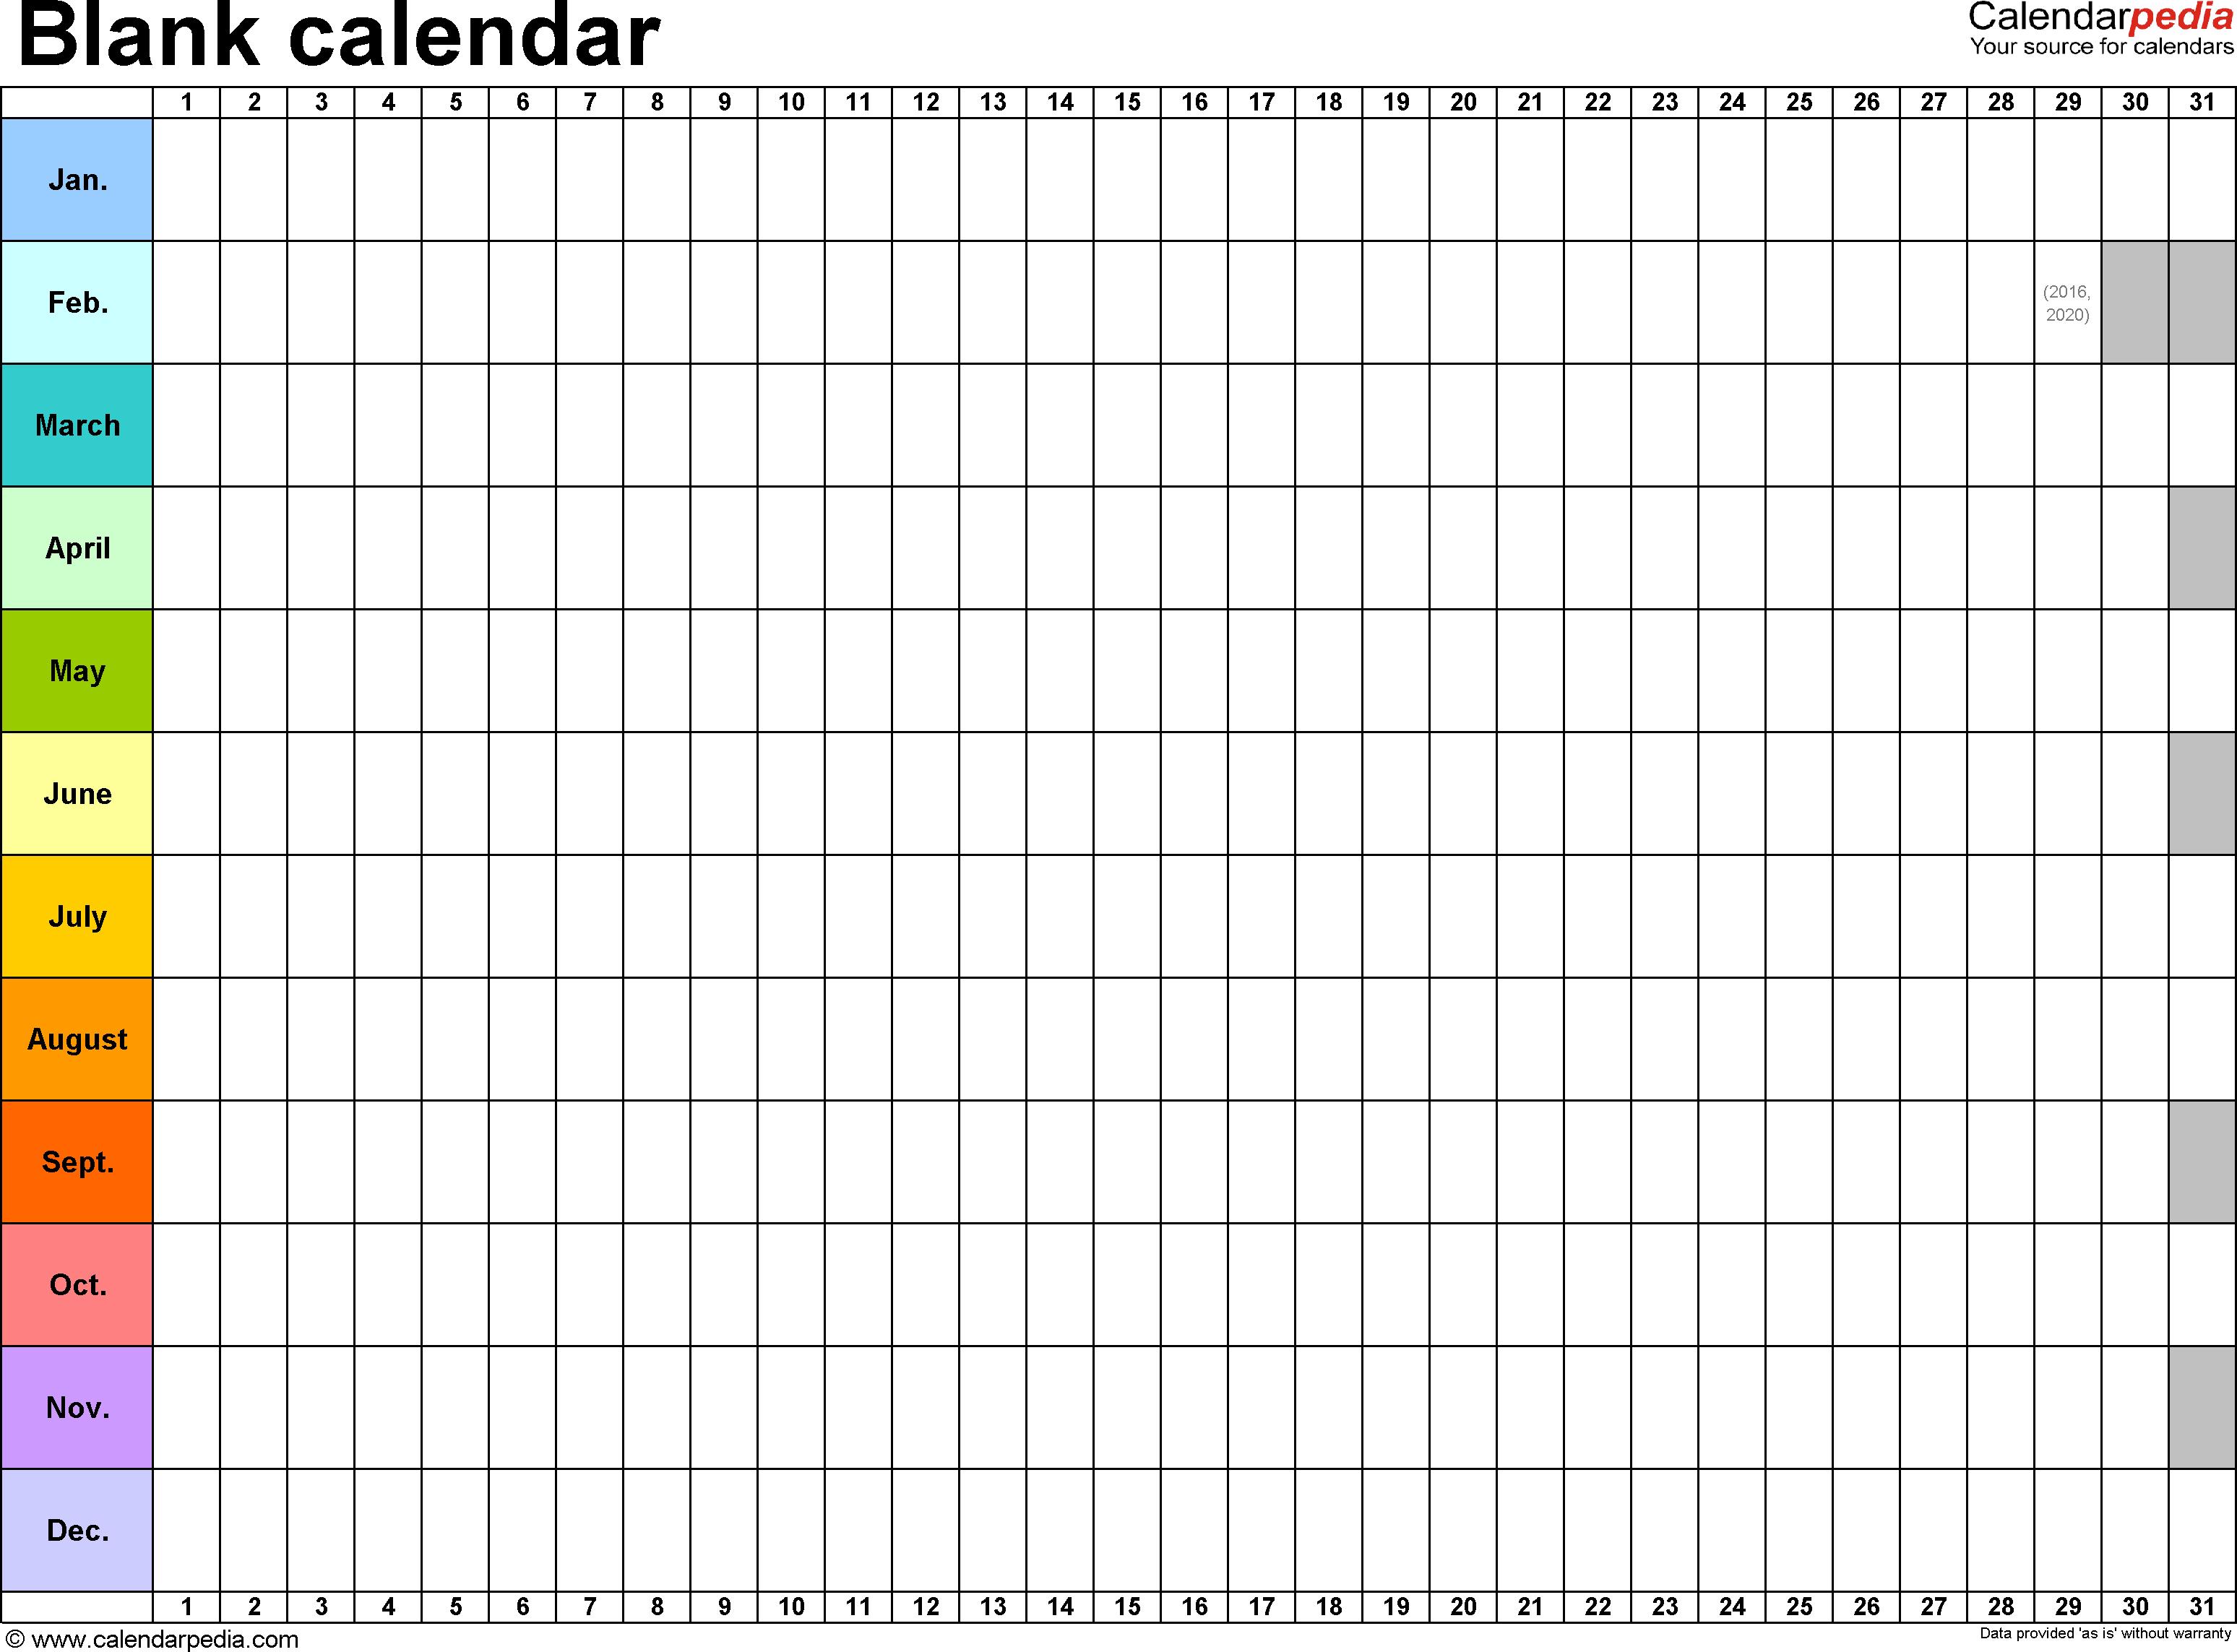 Blank Monthly Planner Template Schedule Planning Calendar Excel regarding Monthly Planner Template For Children